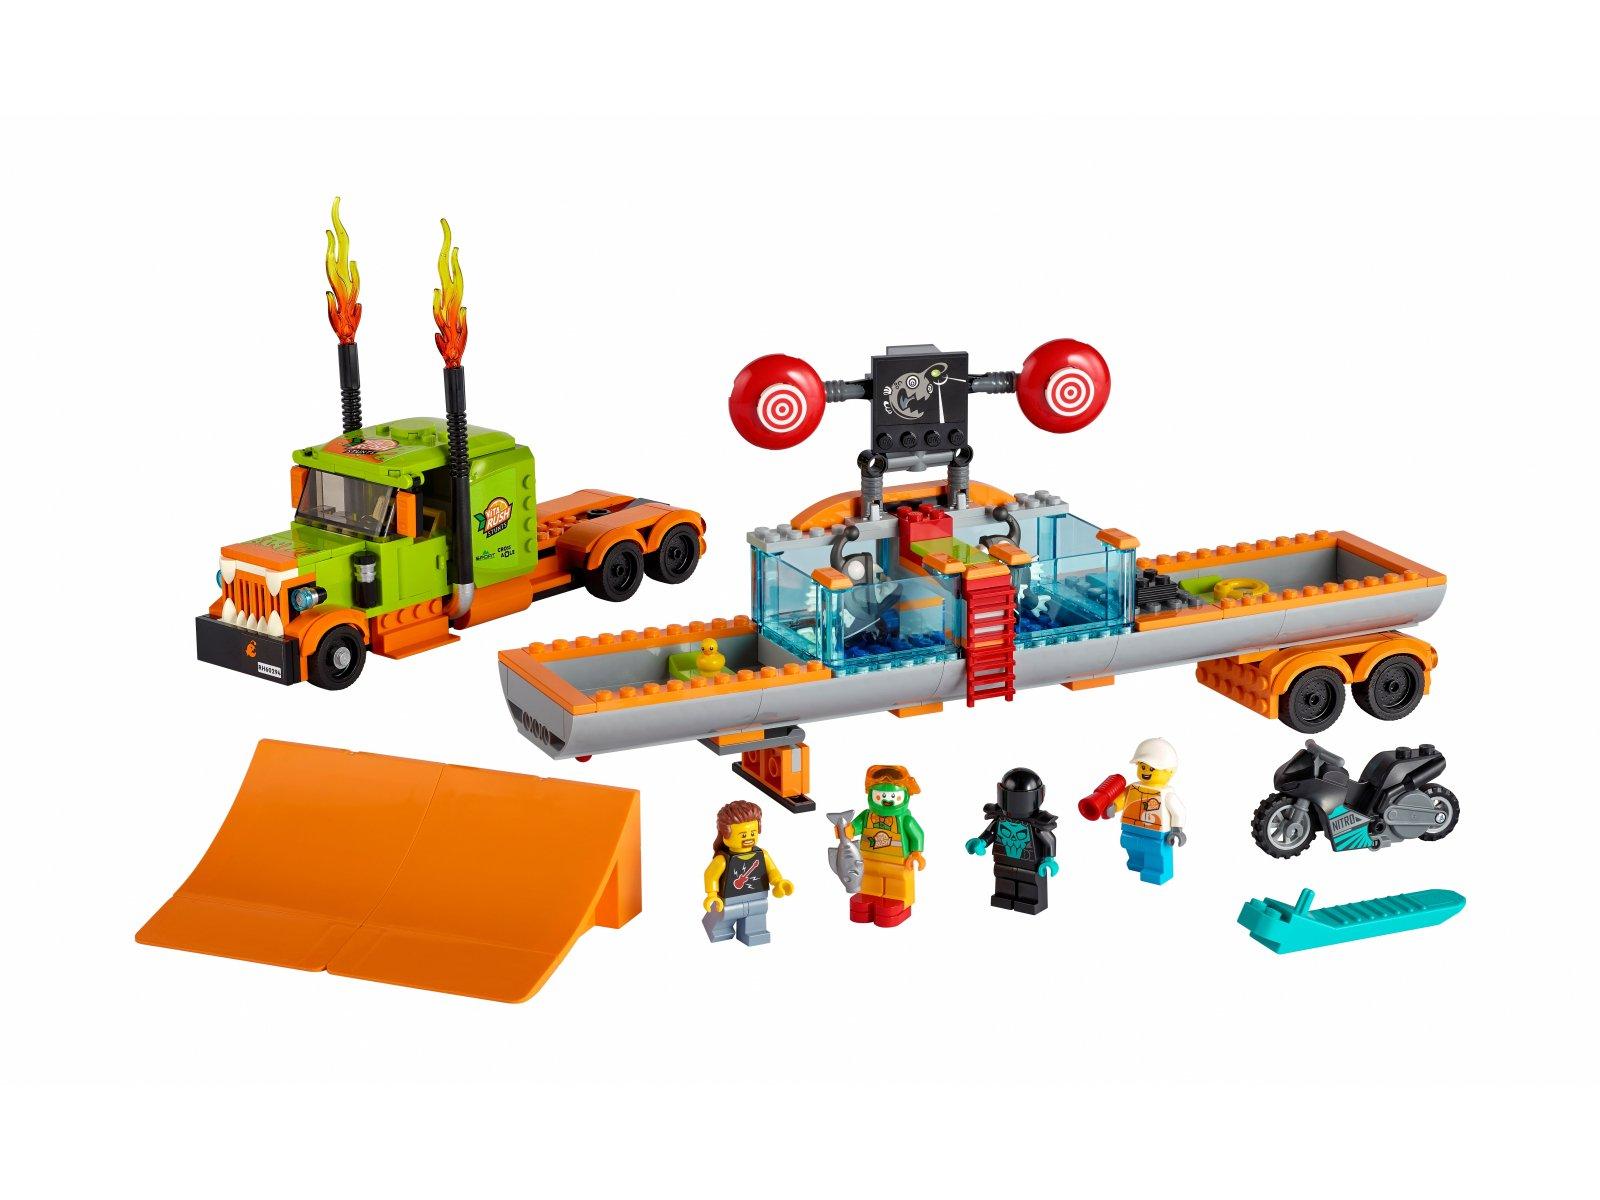 LEGO City 60294 Ciężarówka kaskaderska